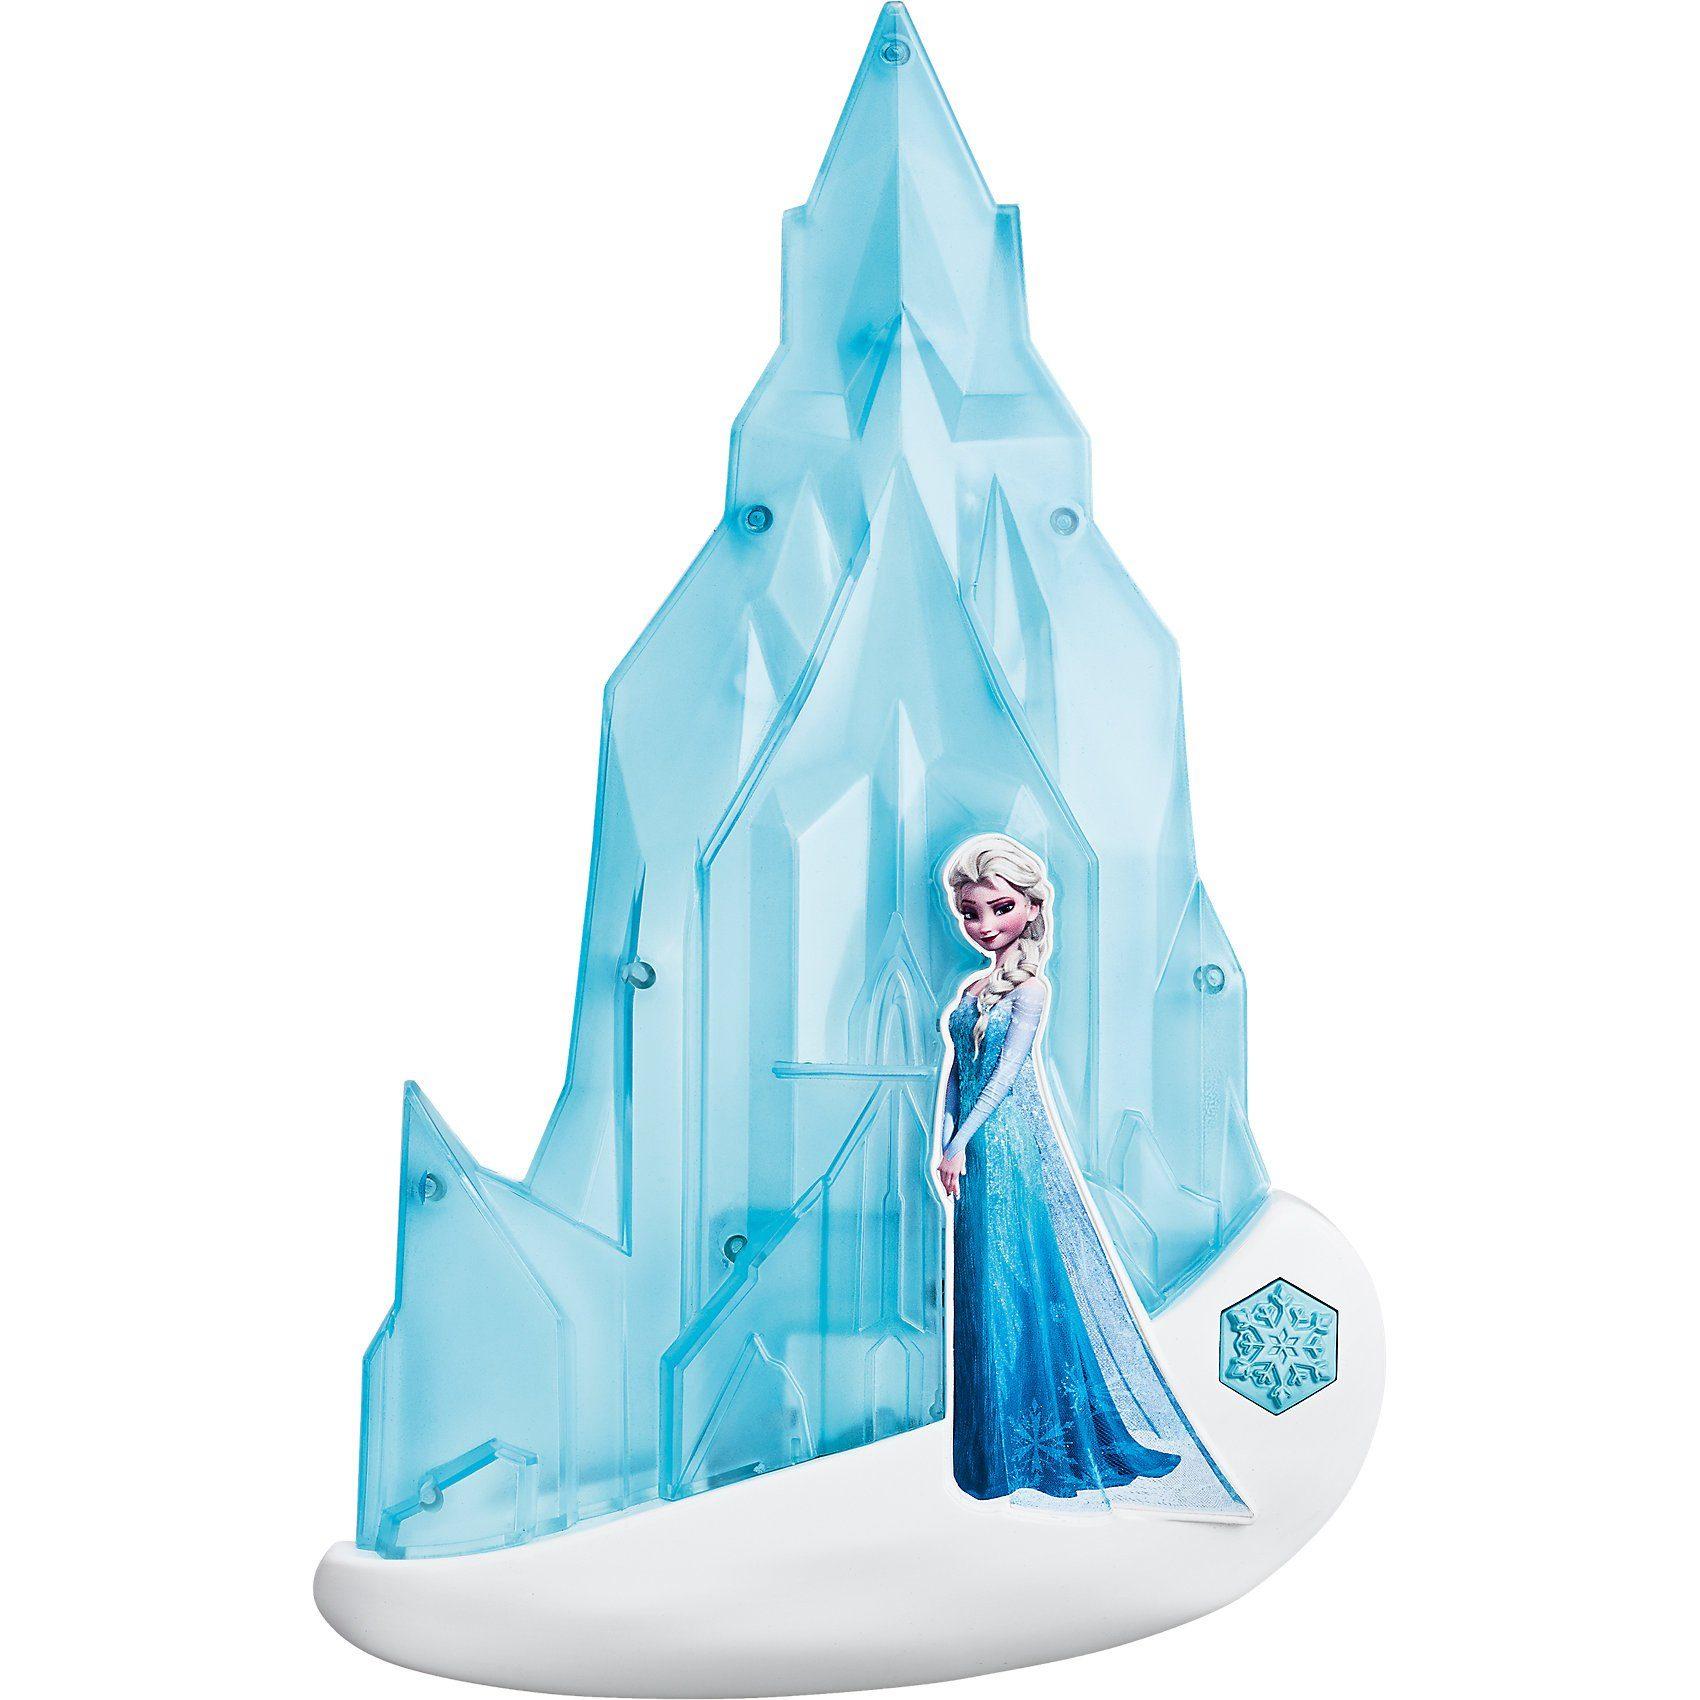 Philips Lighting 3D-Wandlampe, Frozen, LED